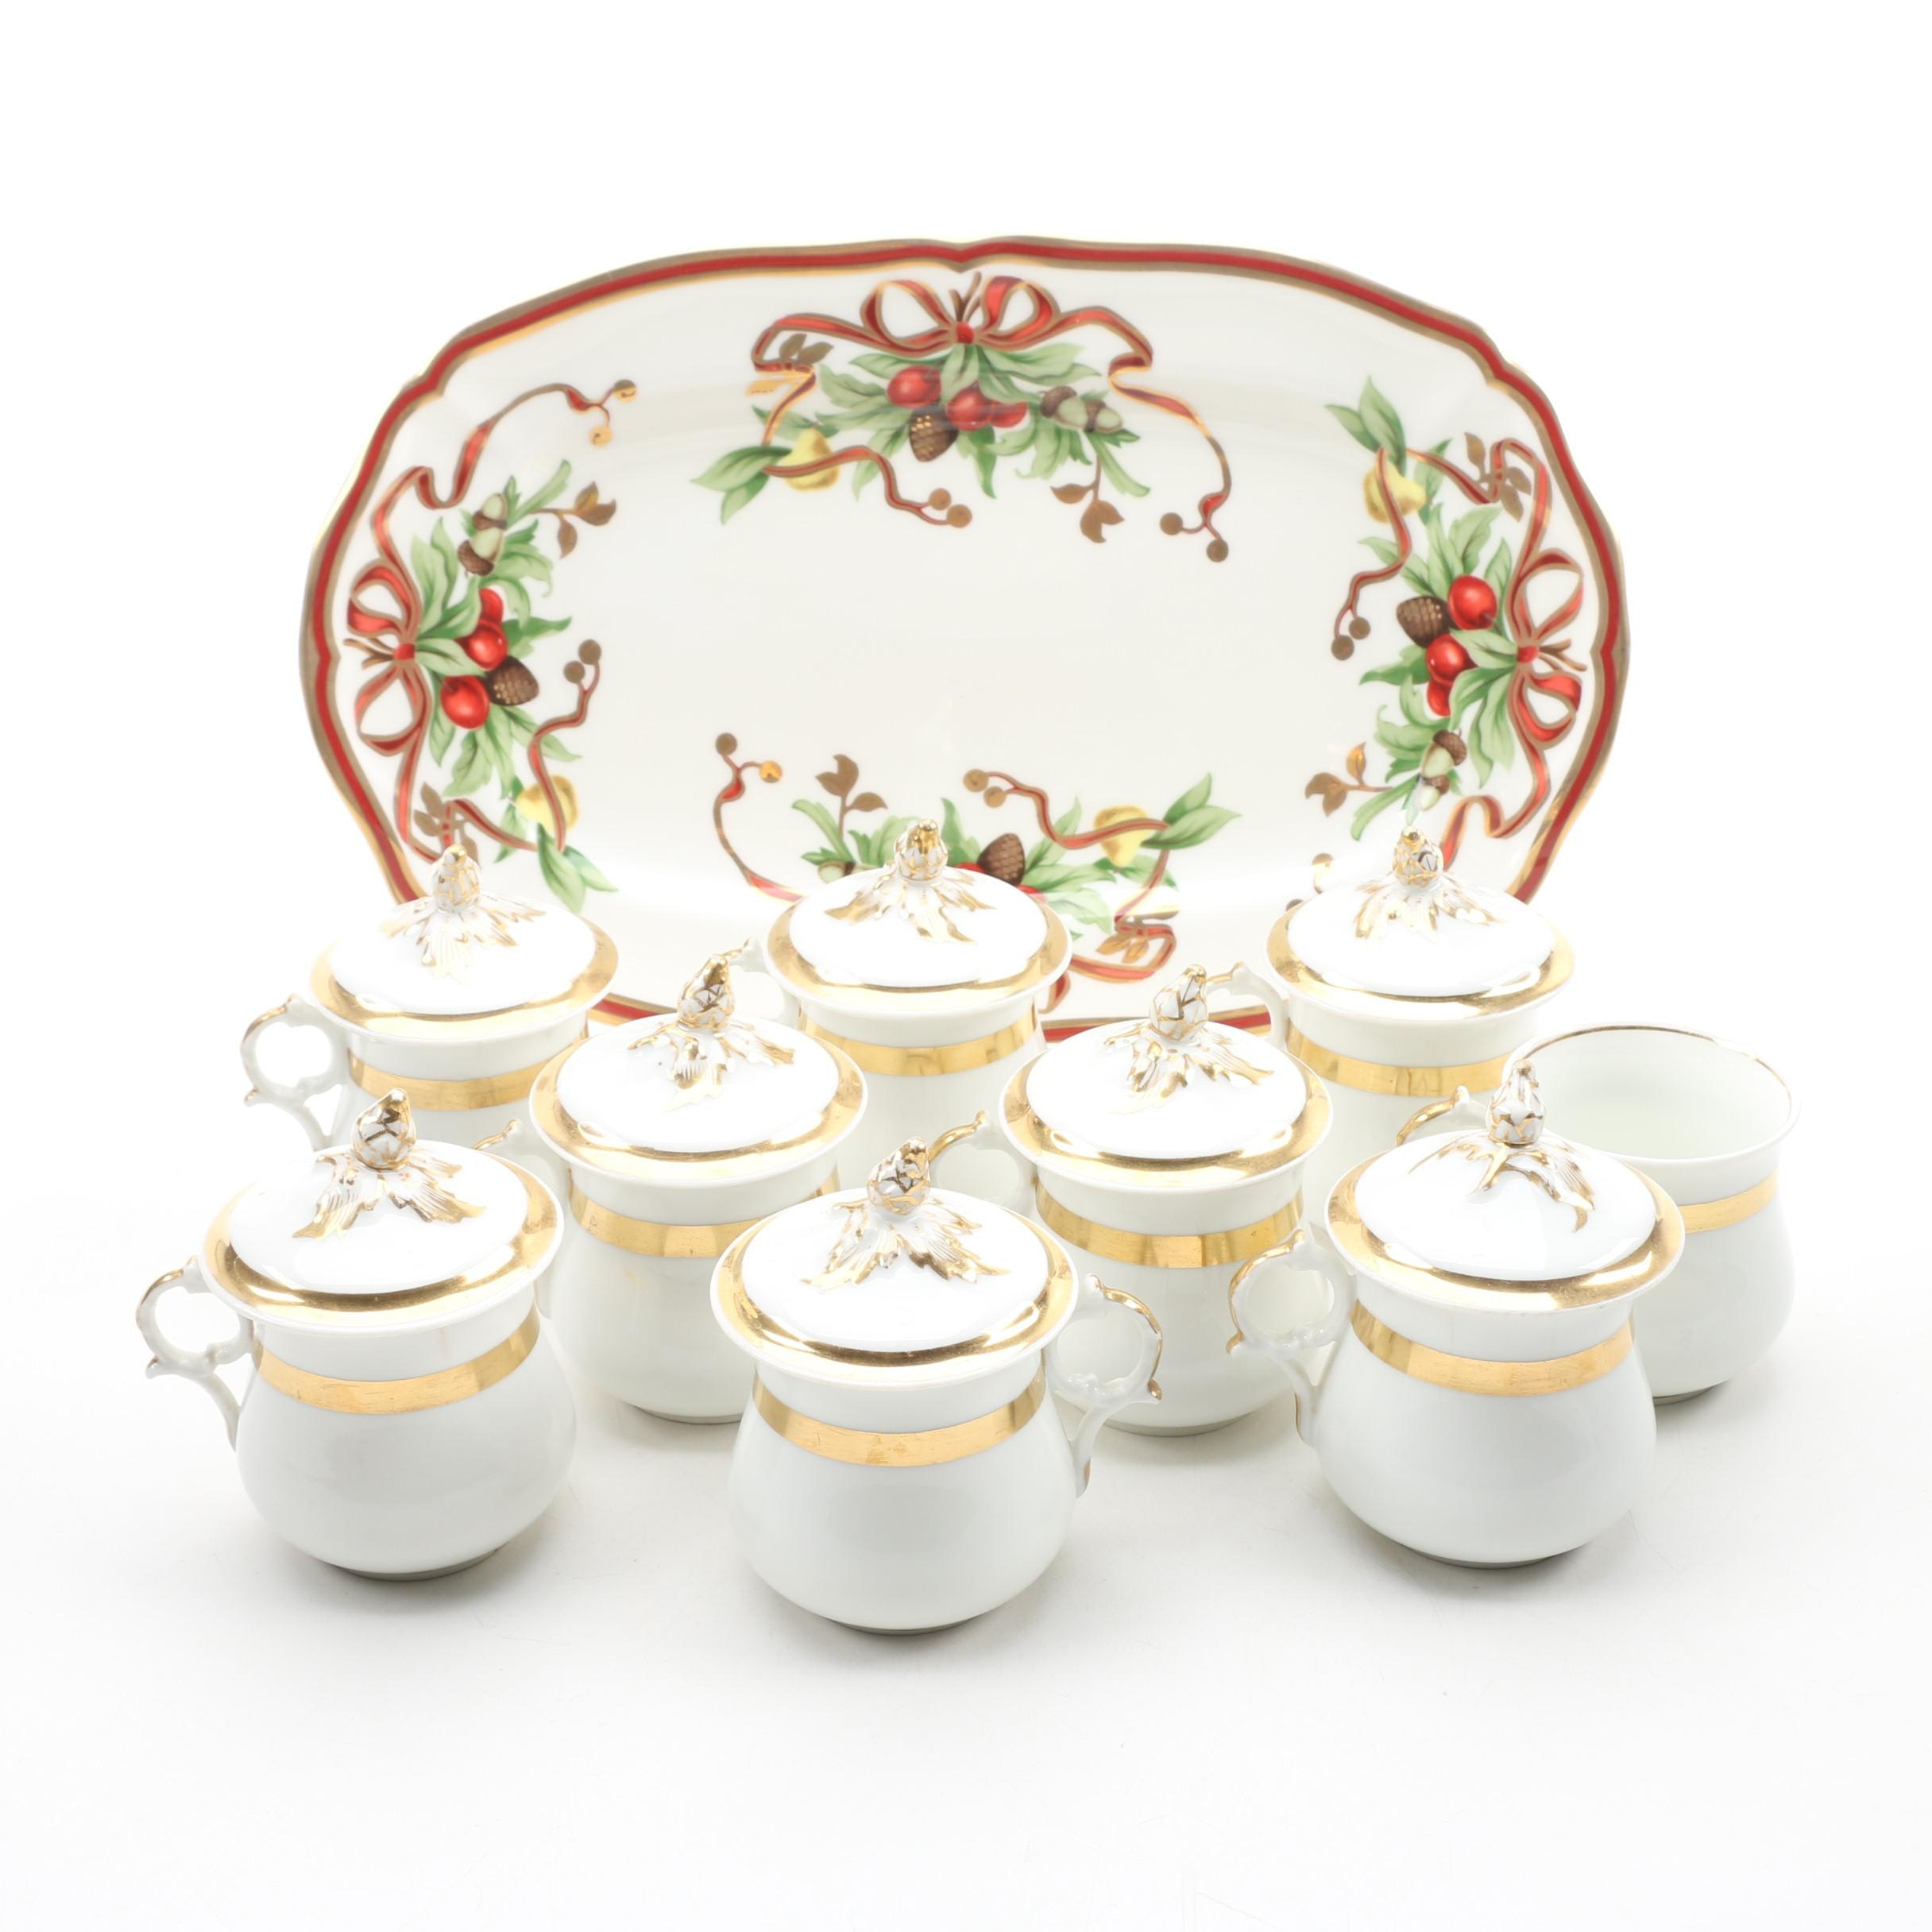 "Tiffany & Co. ""Tiffany Holiday"" Porcelain Sandwich Tray with Custard Cups"